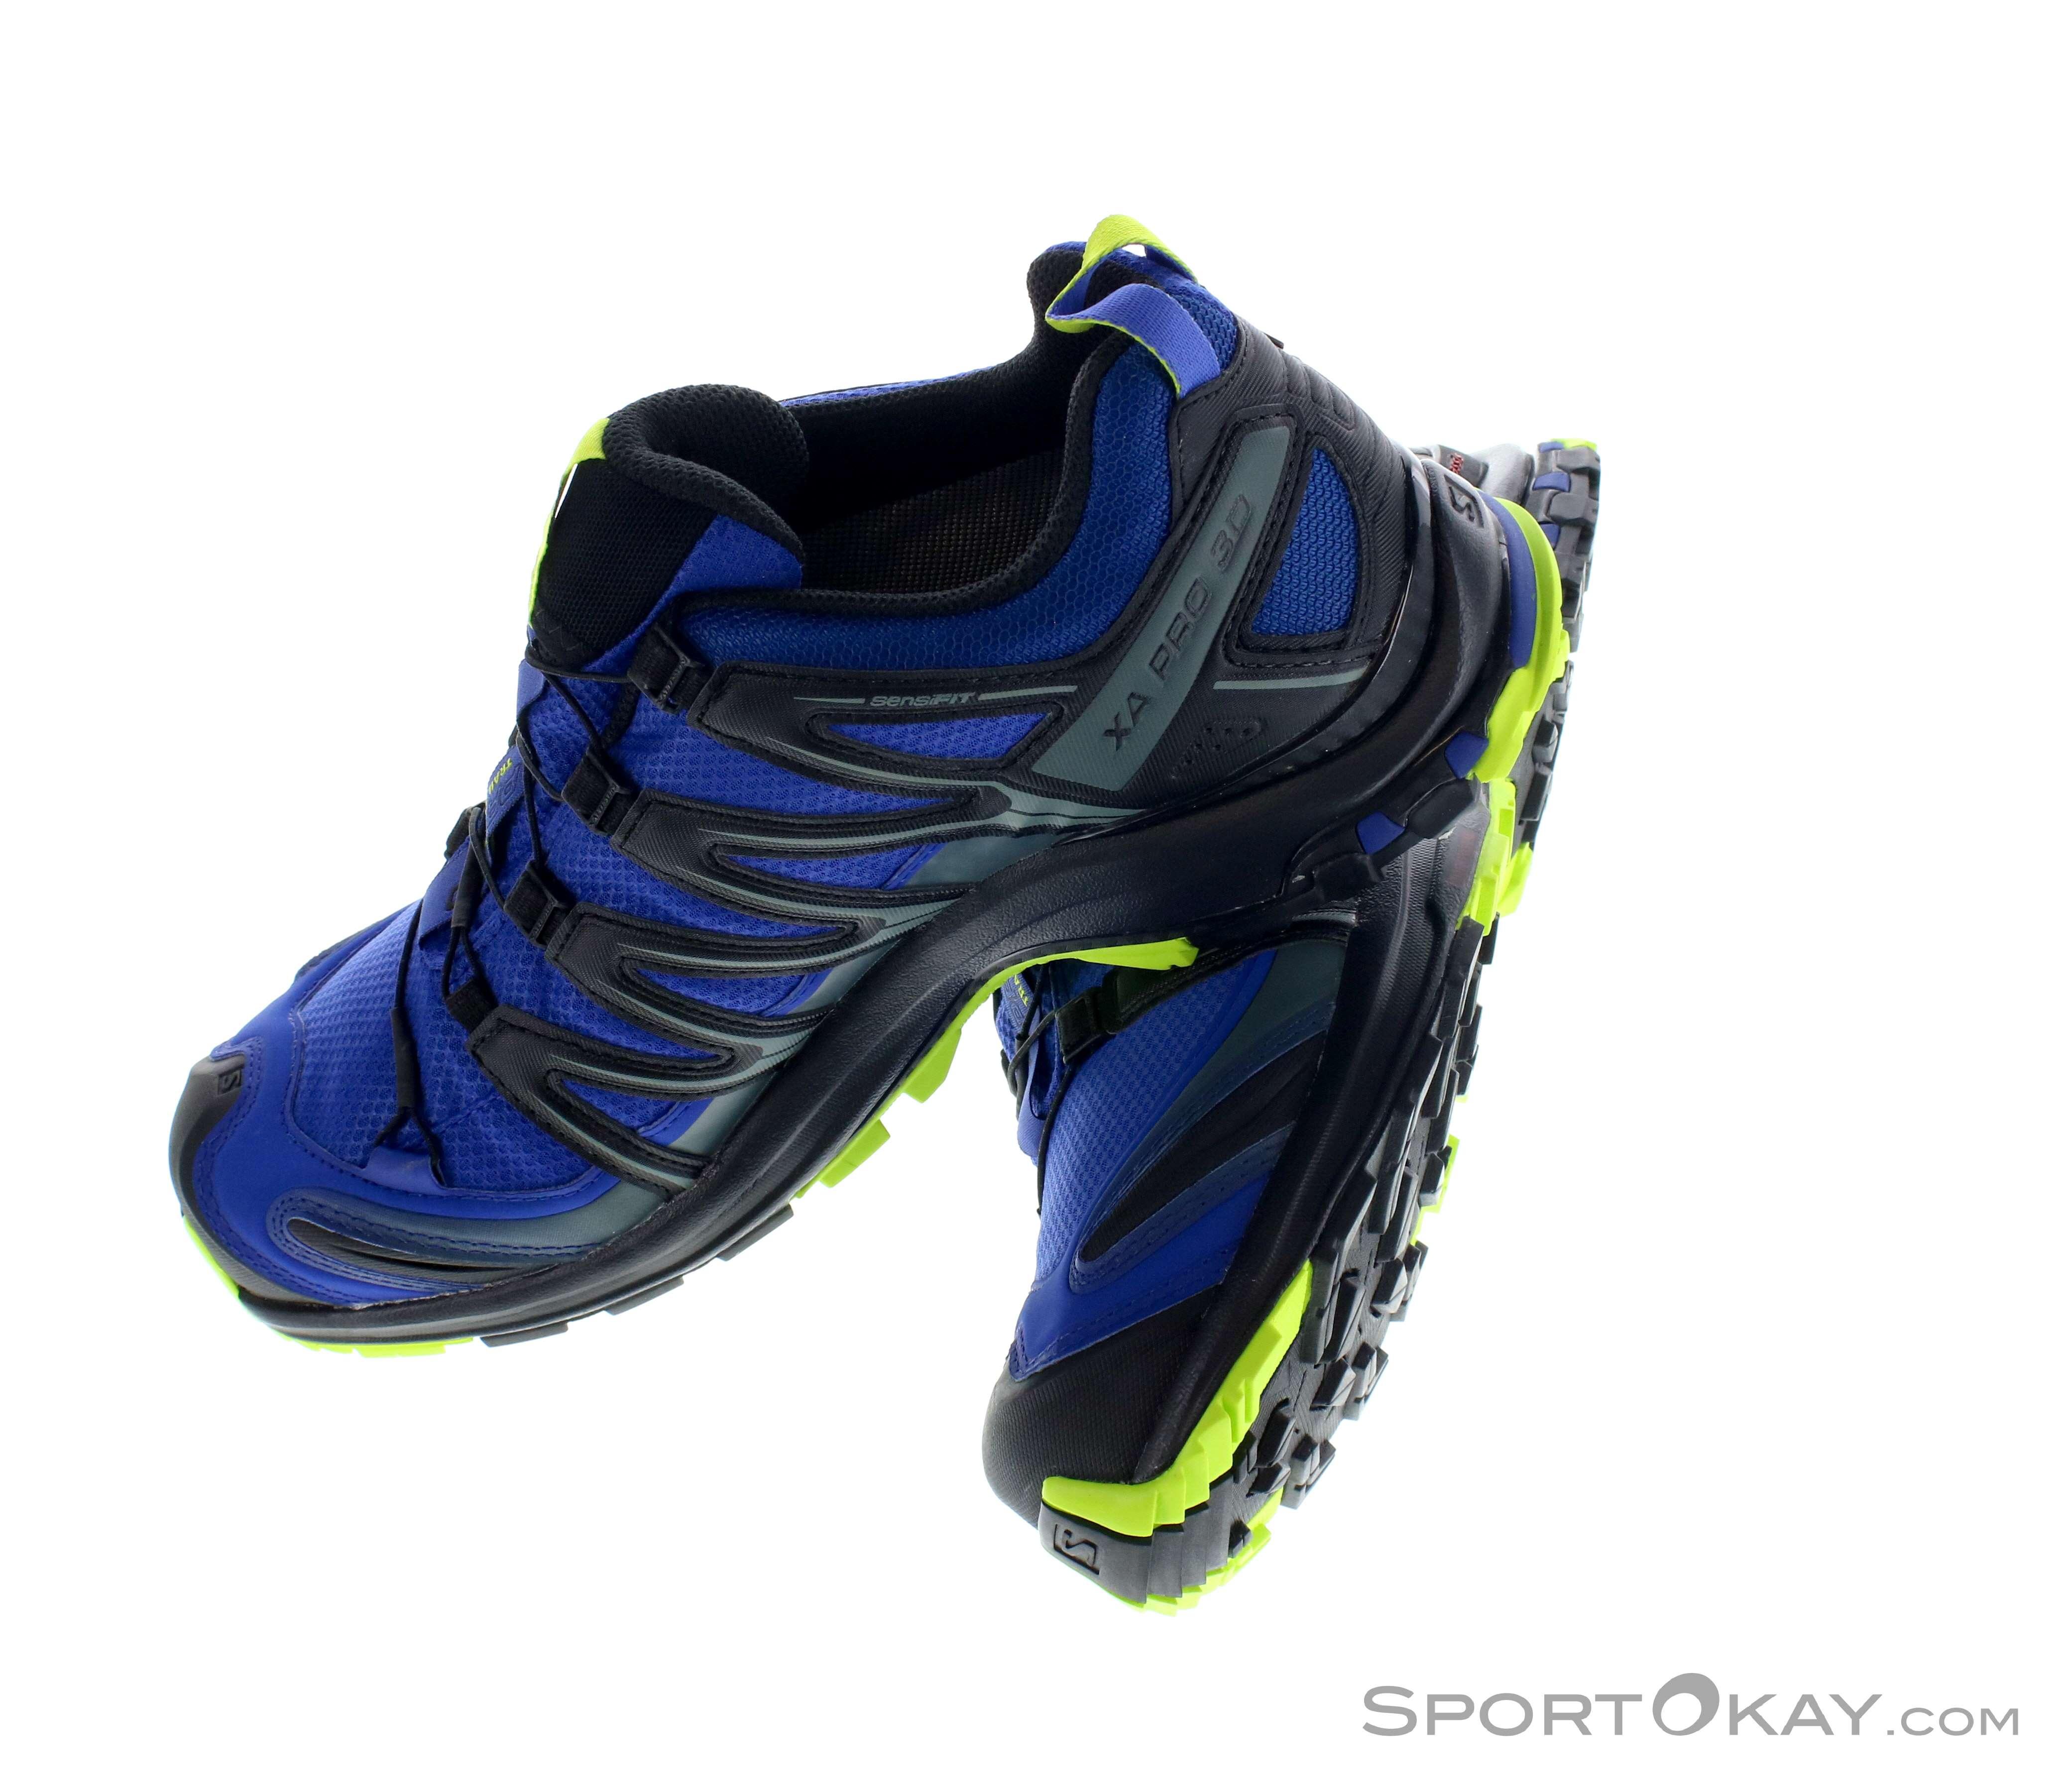 SALOMON Sportschuhe 3D Chassis mountain trail Gr. 45 UK 10,5 TOP